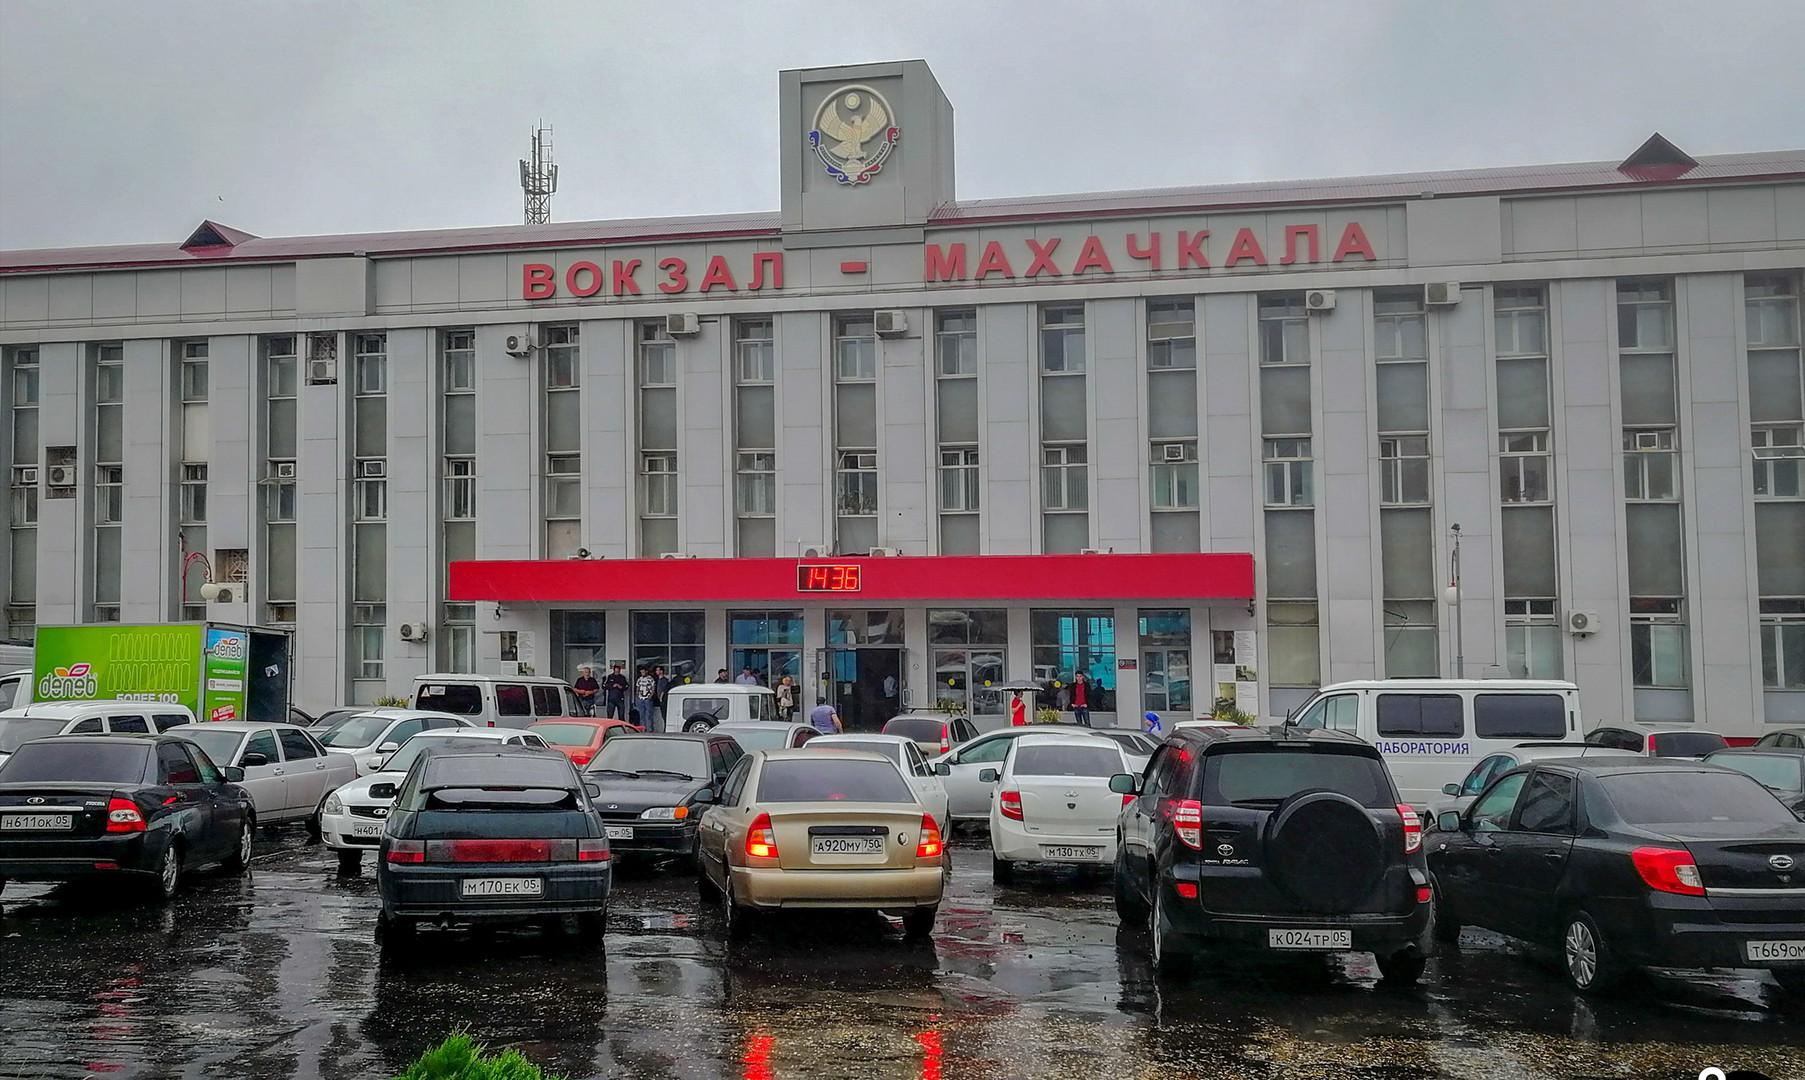 Ж/д вокзал, Махачкала